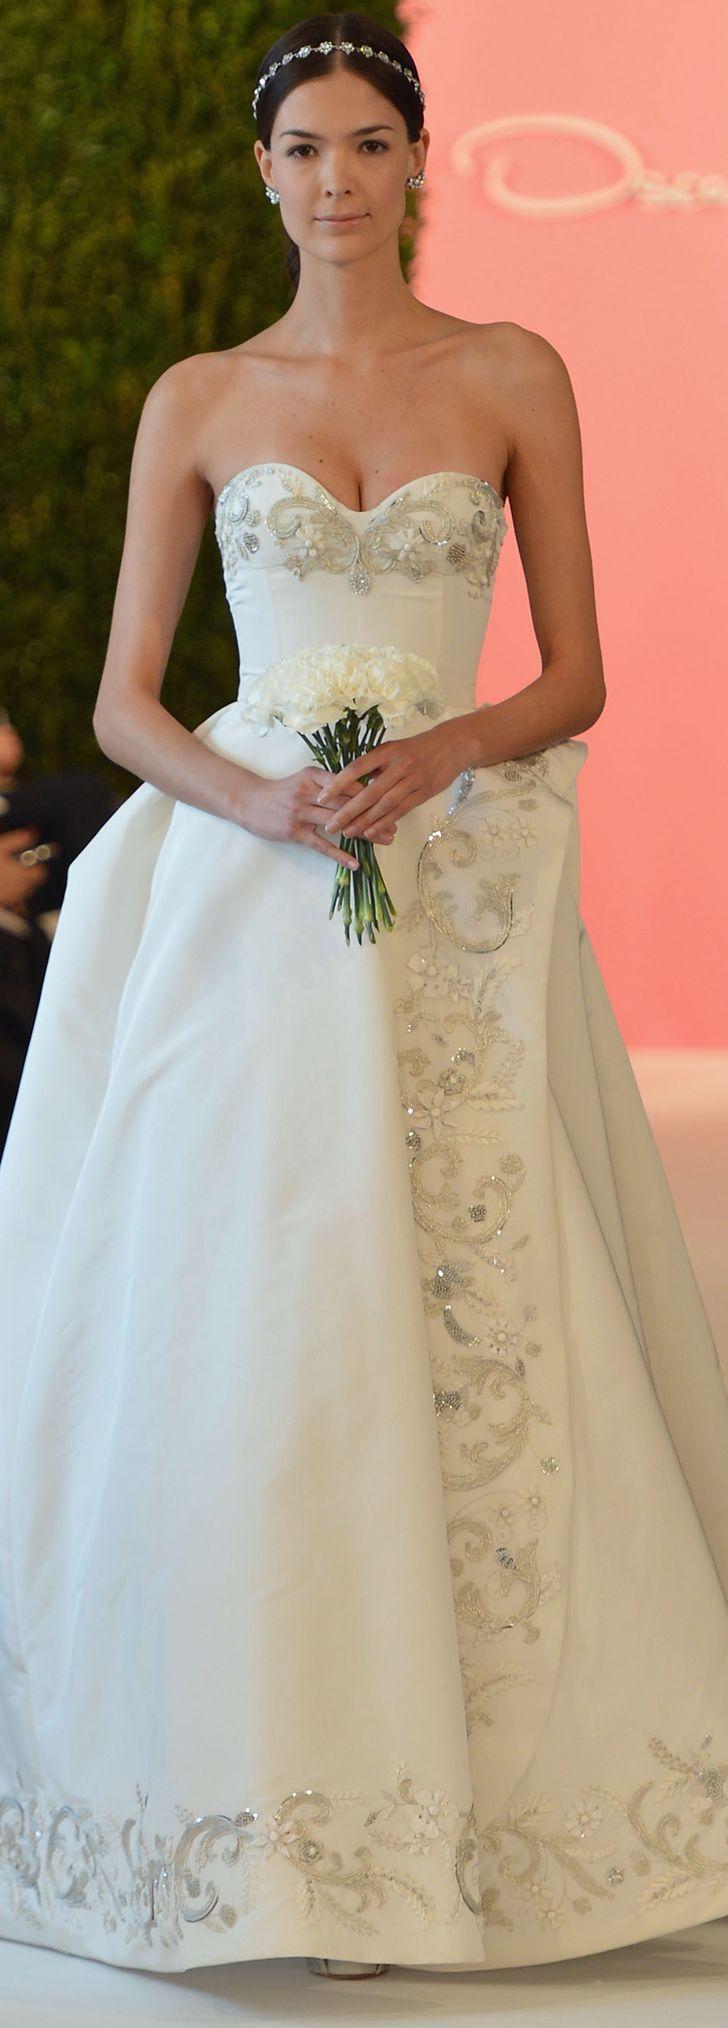 Hochzeit - There Was Something New At Oscar De La Renta Bridal